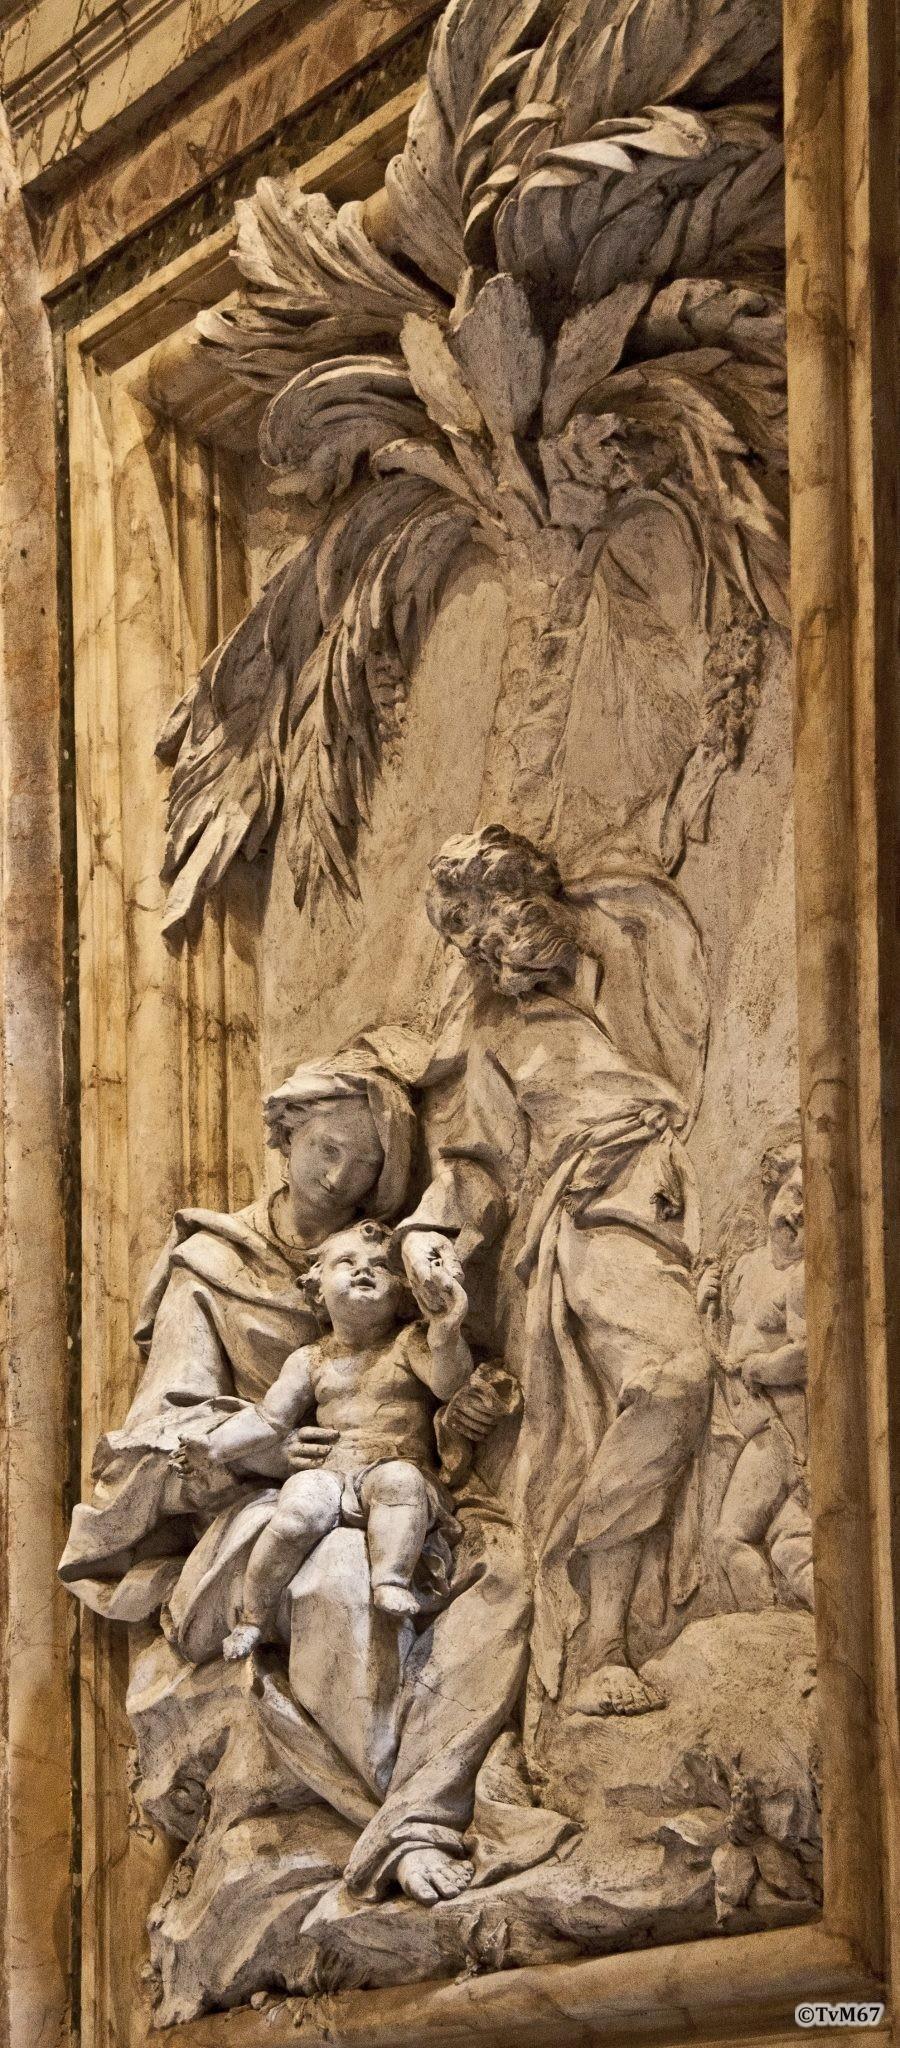 Roma, Pantheon, 7e k, Cap di San Giuseppe di Terra Santa, Monaldi, rust tijdens vlucht naar Egypte, 2011